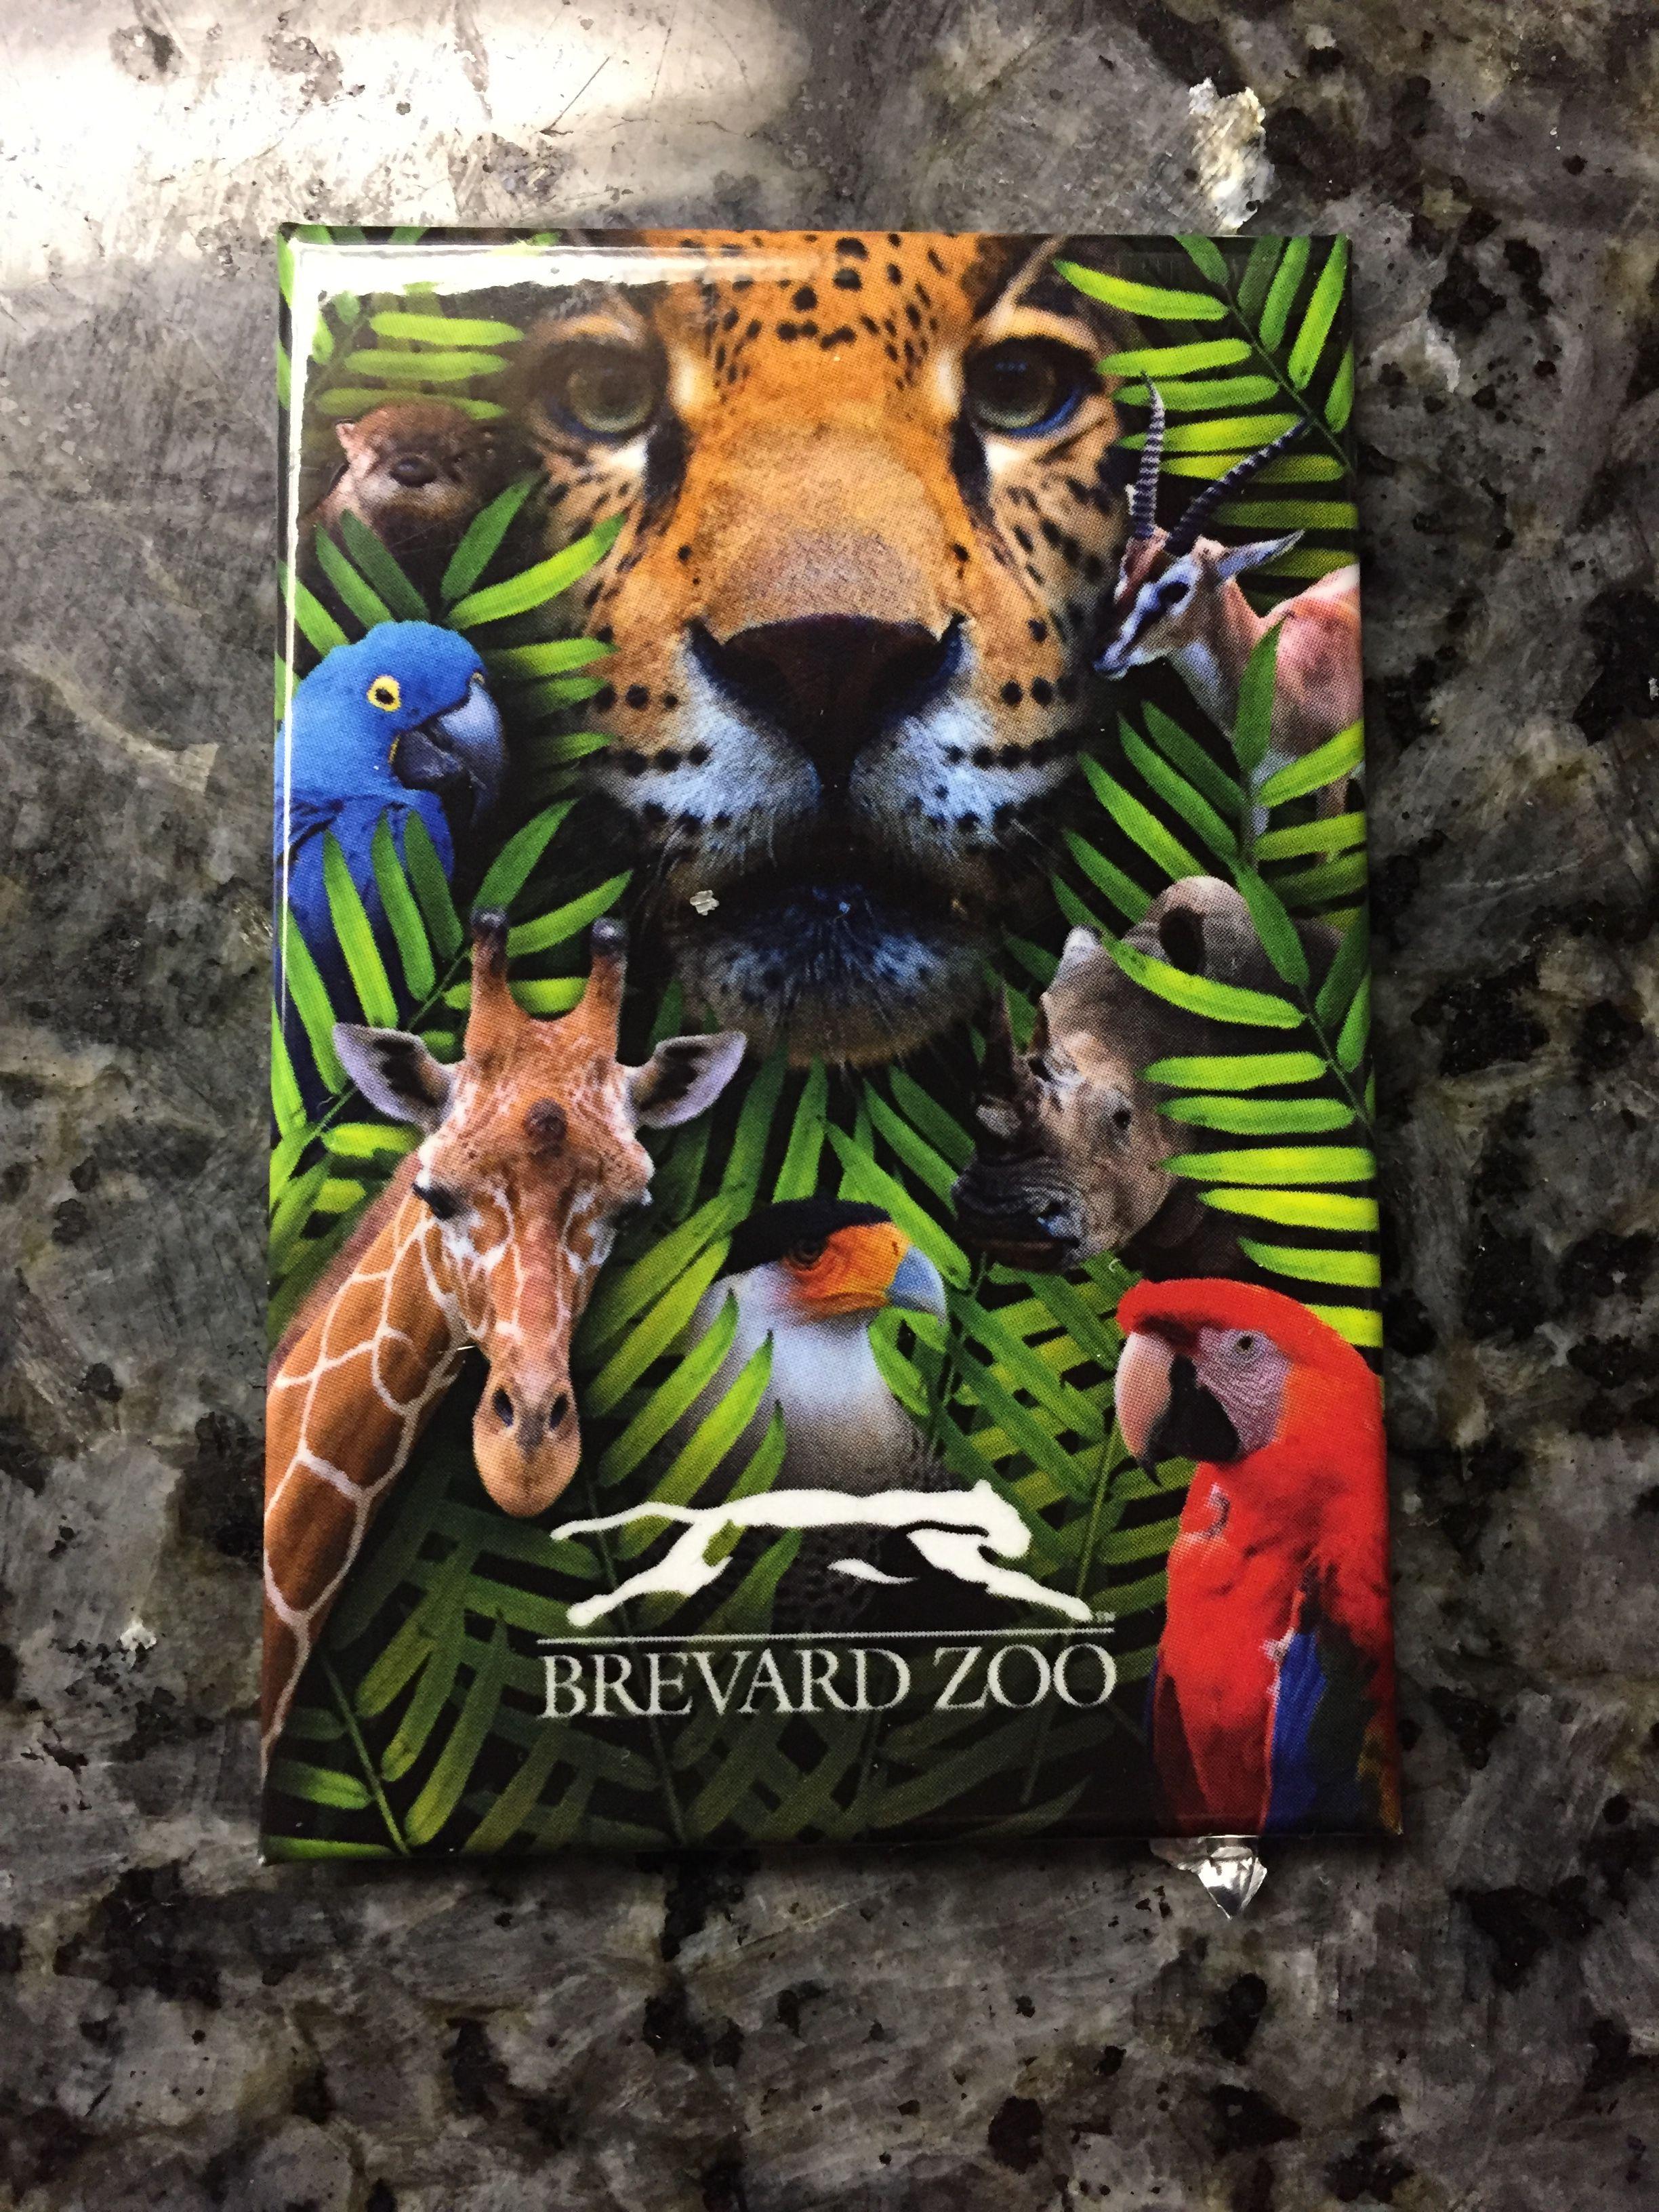 Brevard Zoo, Melbourne,Florida Brevard zoo, Zoo, Lion